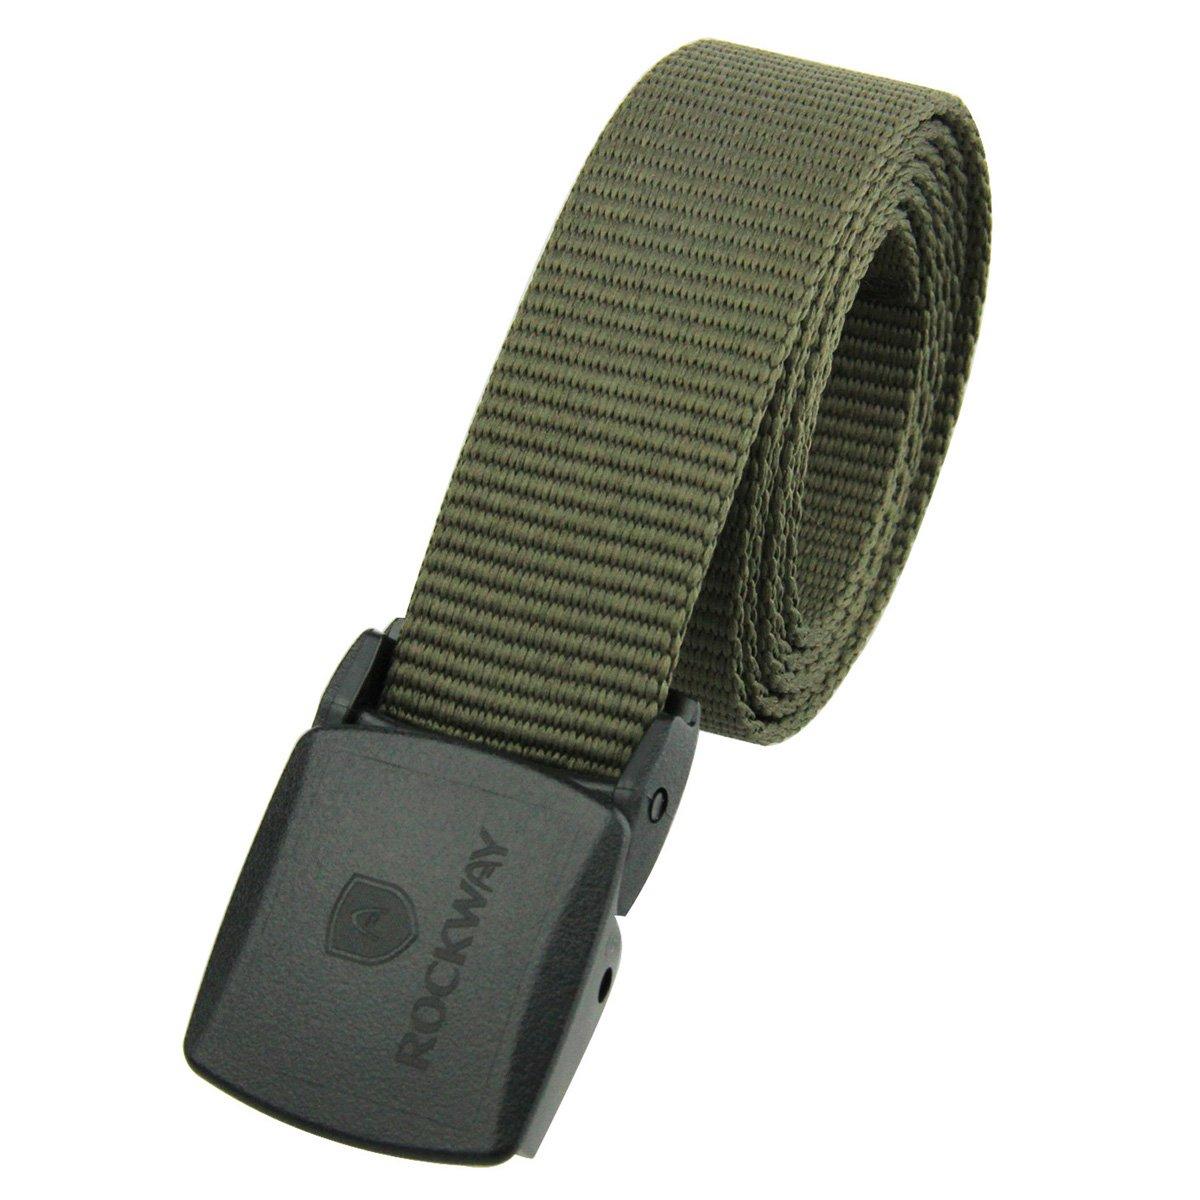 RockWay Men's Eco-friend Khaki PET with YKK POM Buckle Leisure Style Belt (Small/105cm)